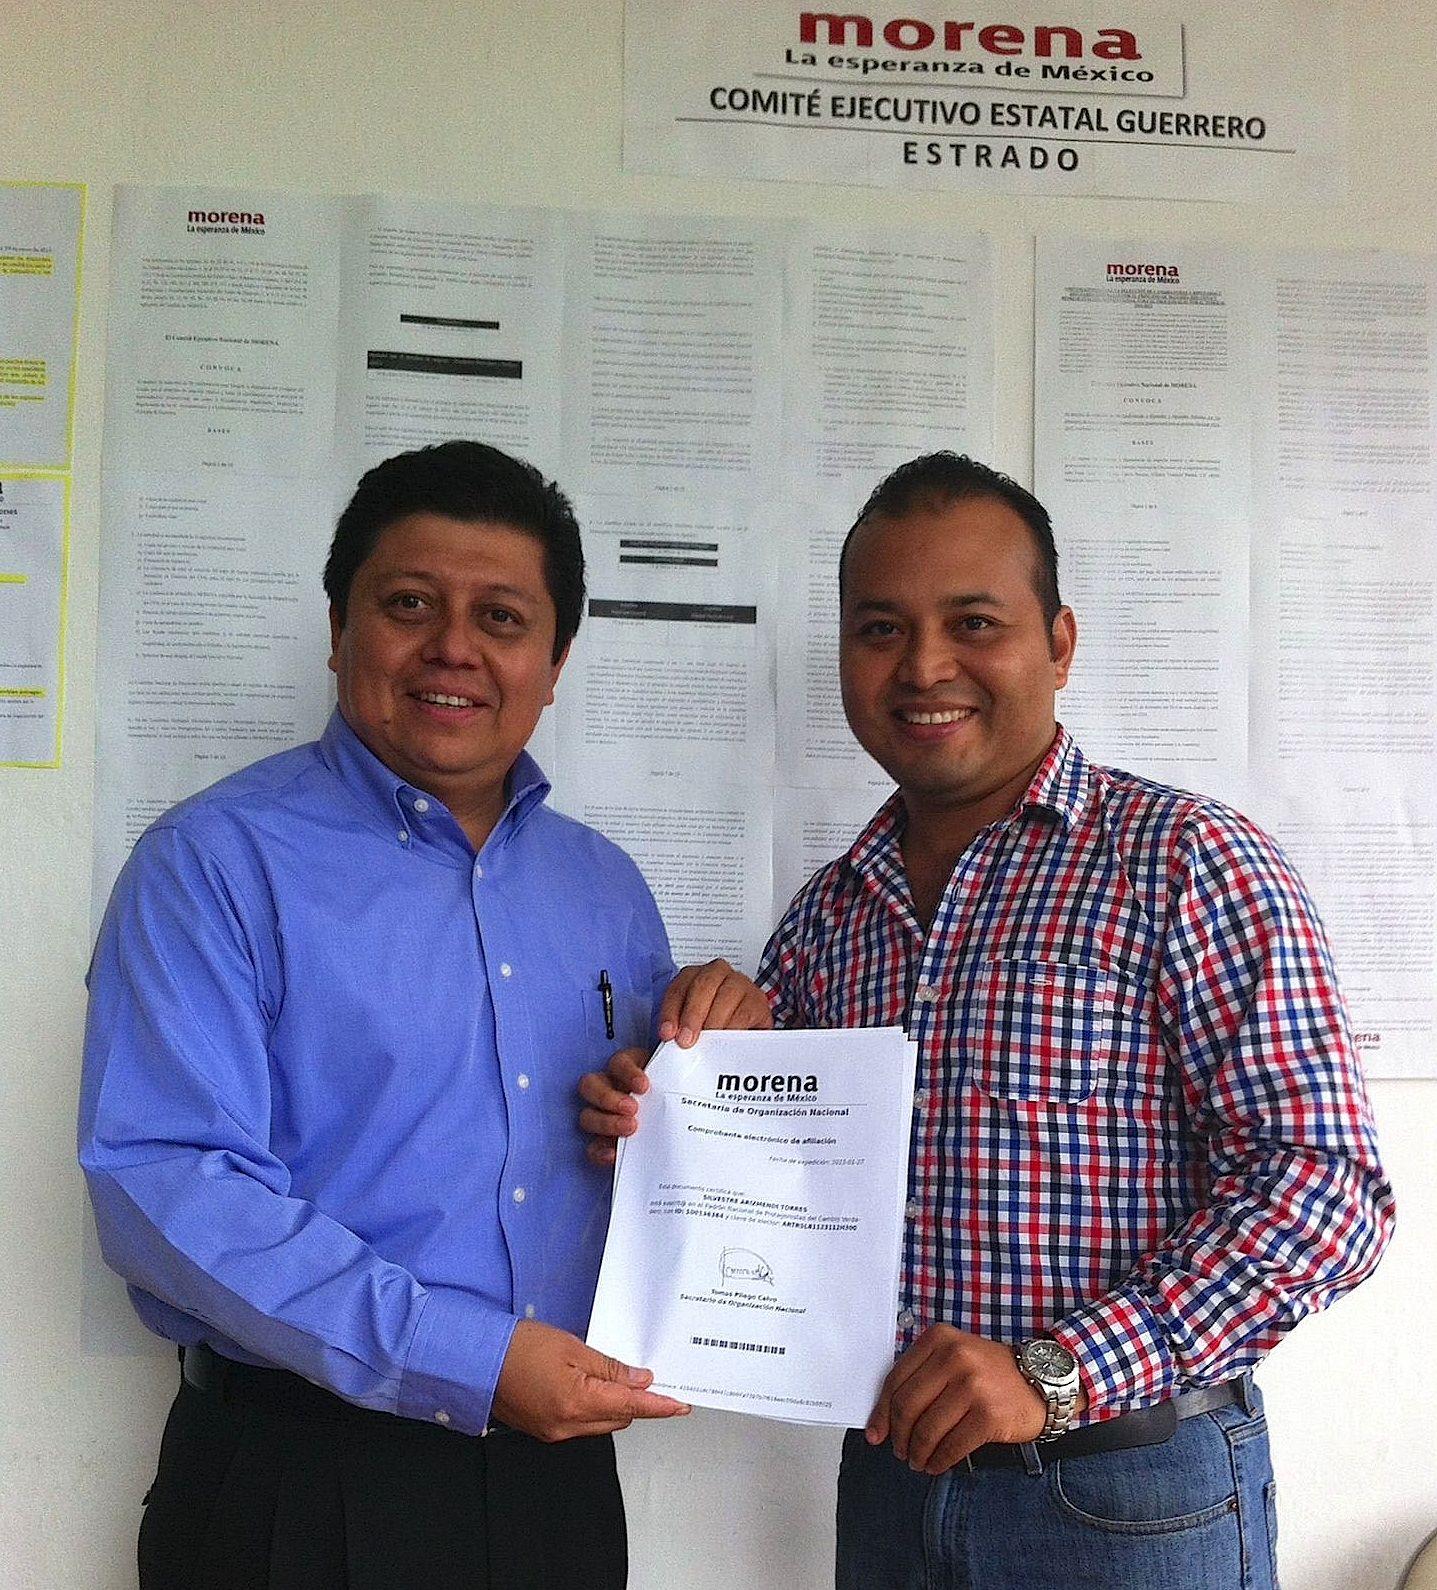 Silvestre Arizmendi se registró por el distrito nueve - http://notimundo.com.mx/estados/silvestre-arizmendi-se-registro-por-el-distrito-nueve/29238